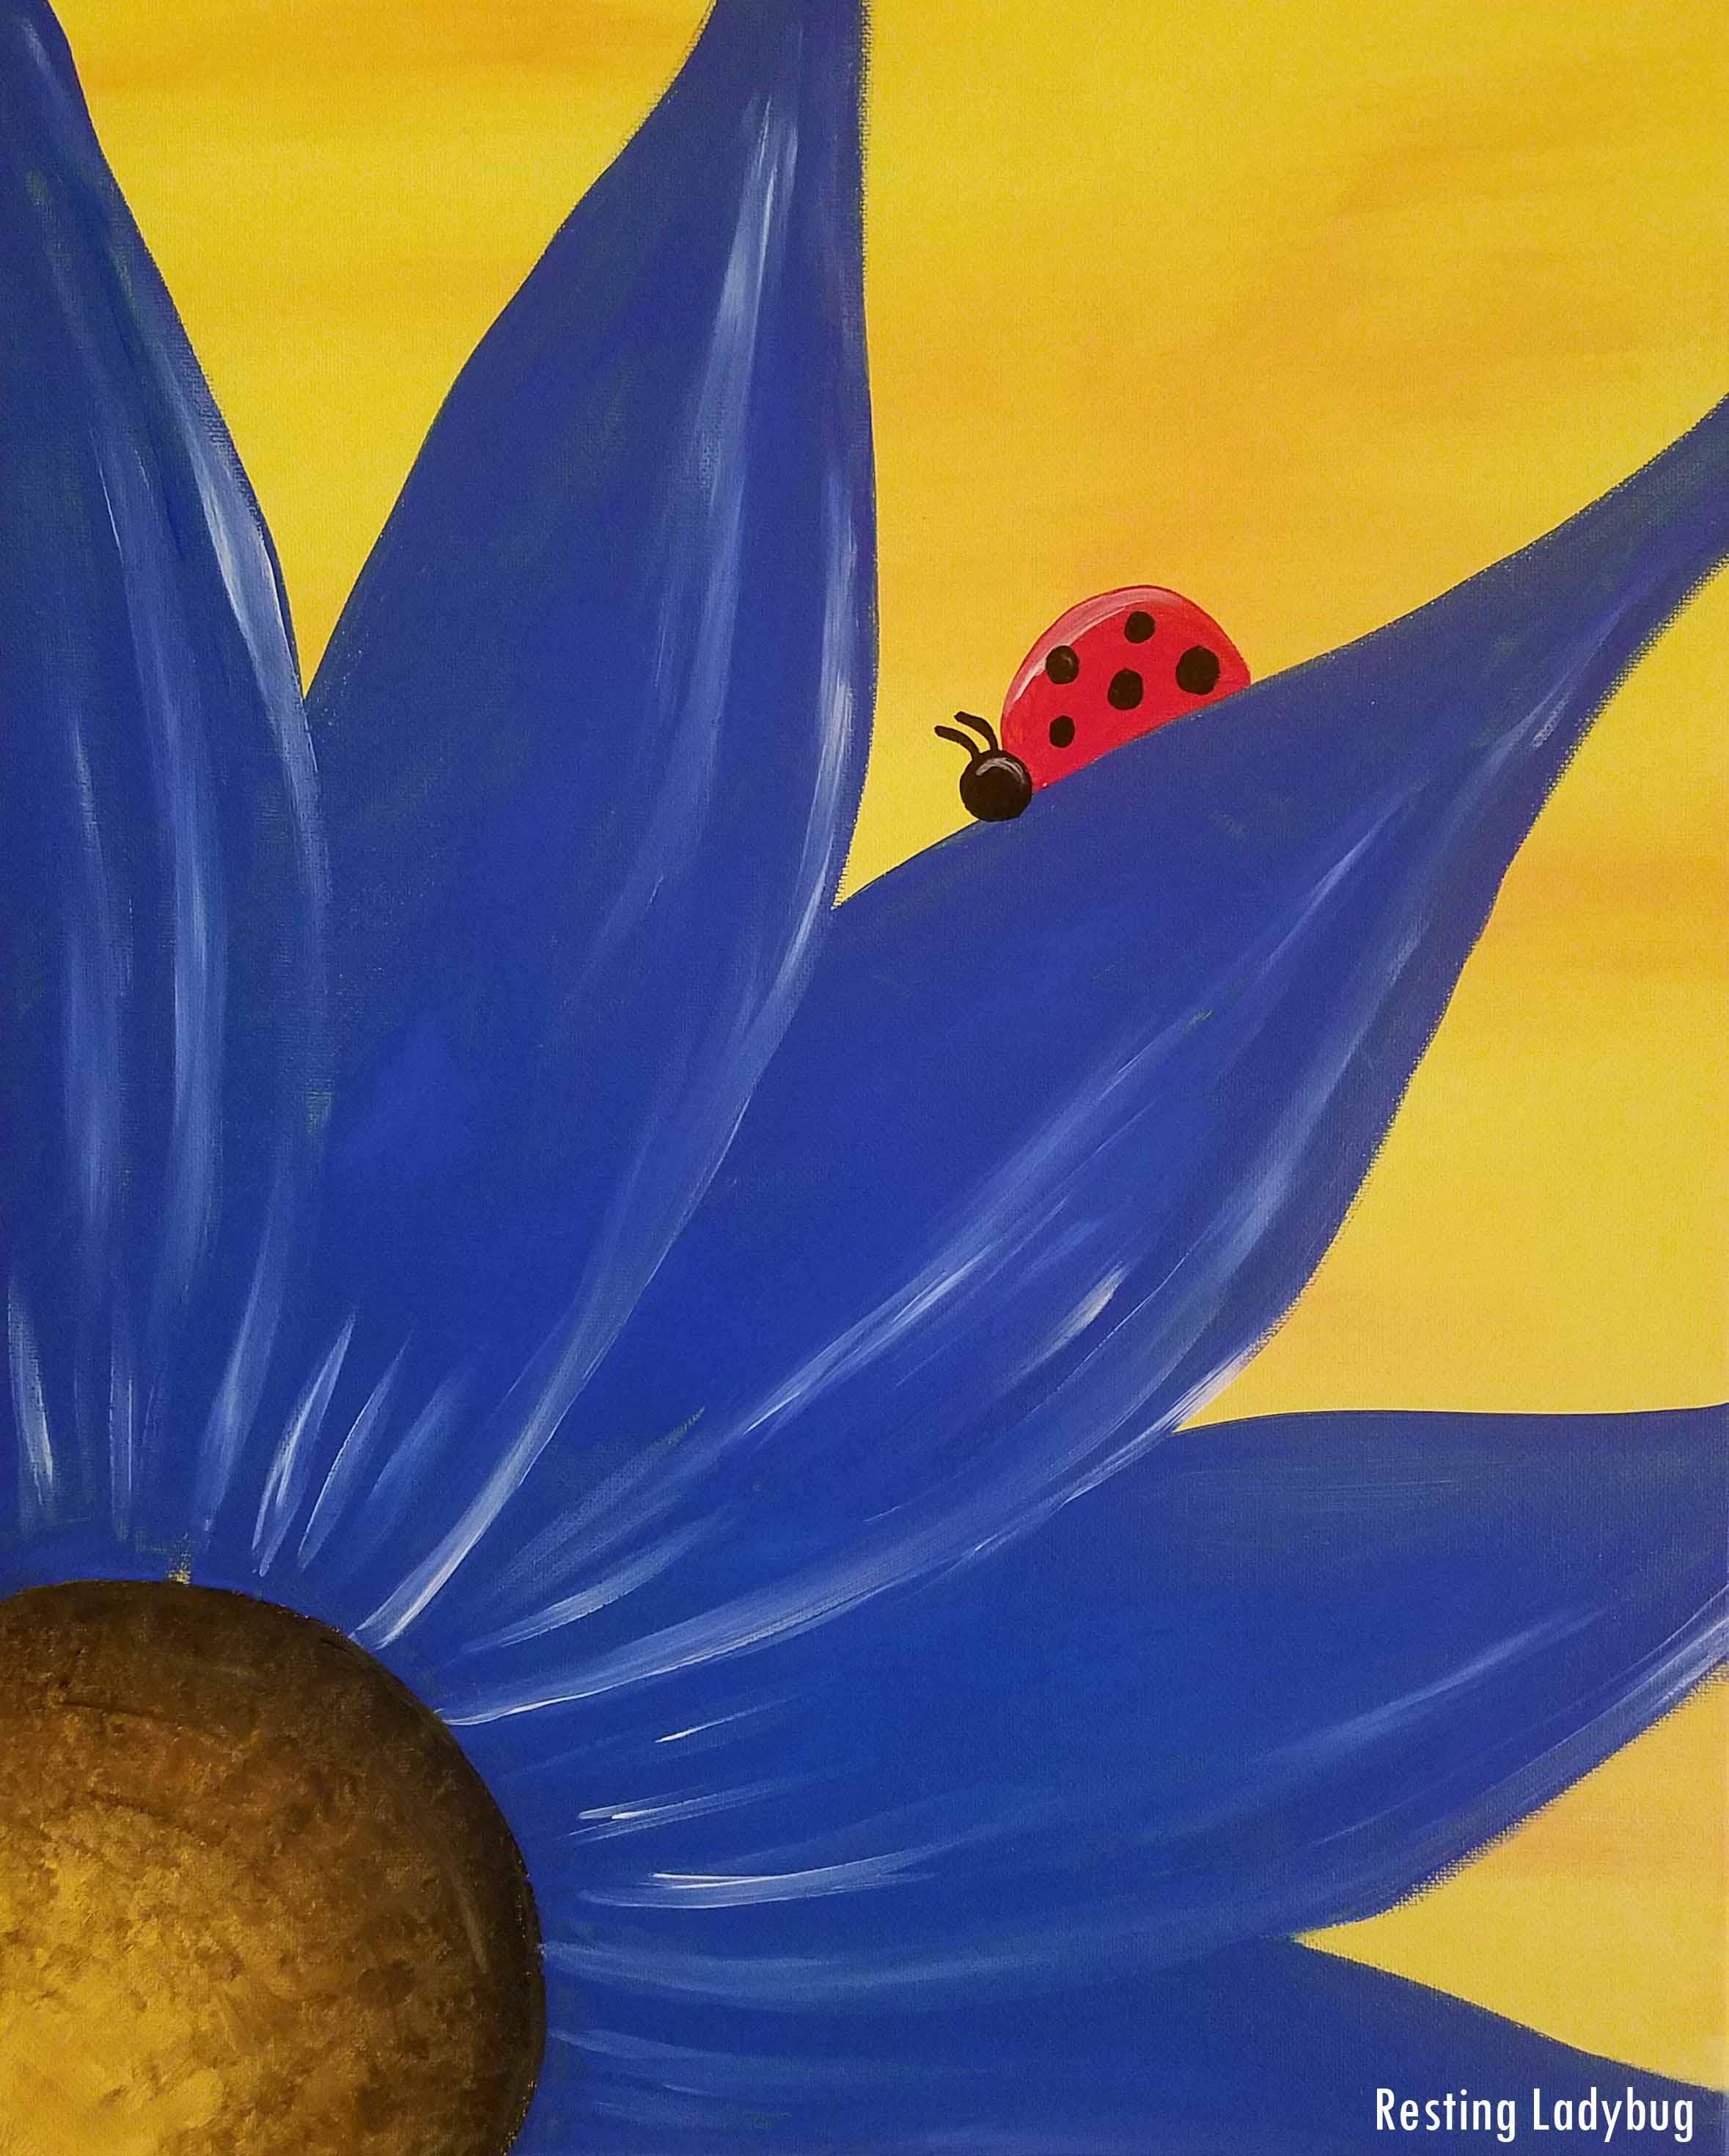 Resting Ladybug.jpg